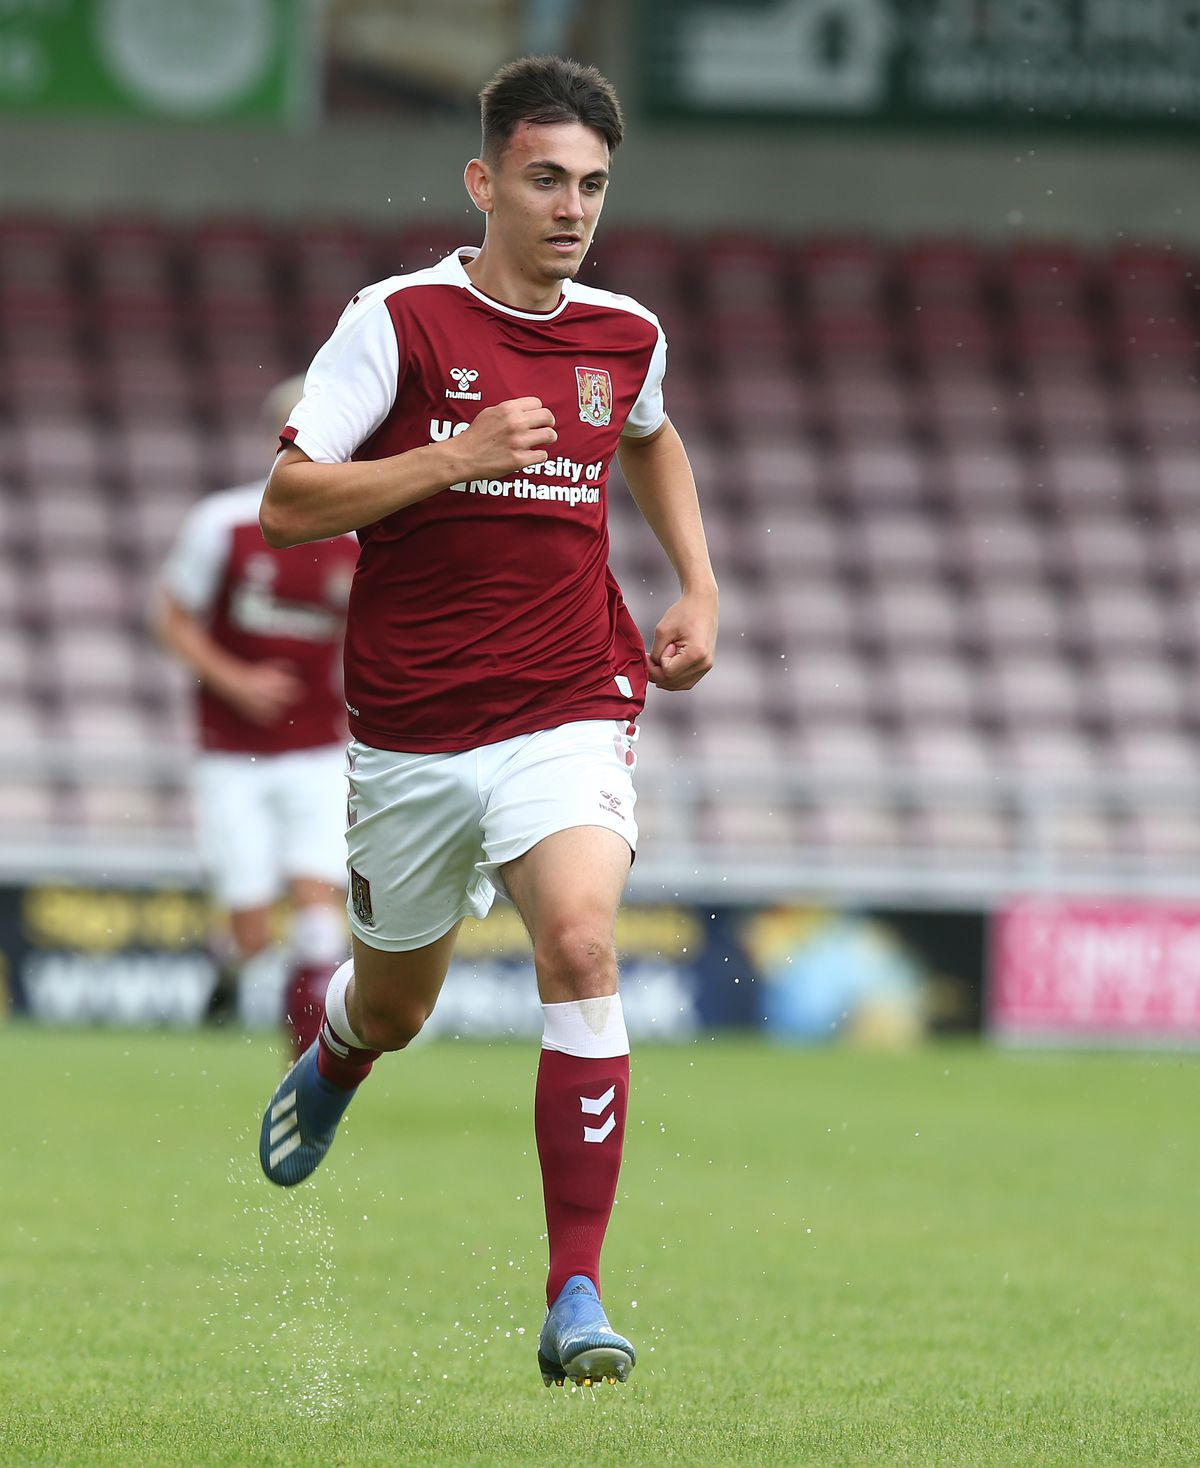 Northampton Town v West Bromwich Albion U23 - Pre-Season Friendly